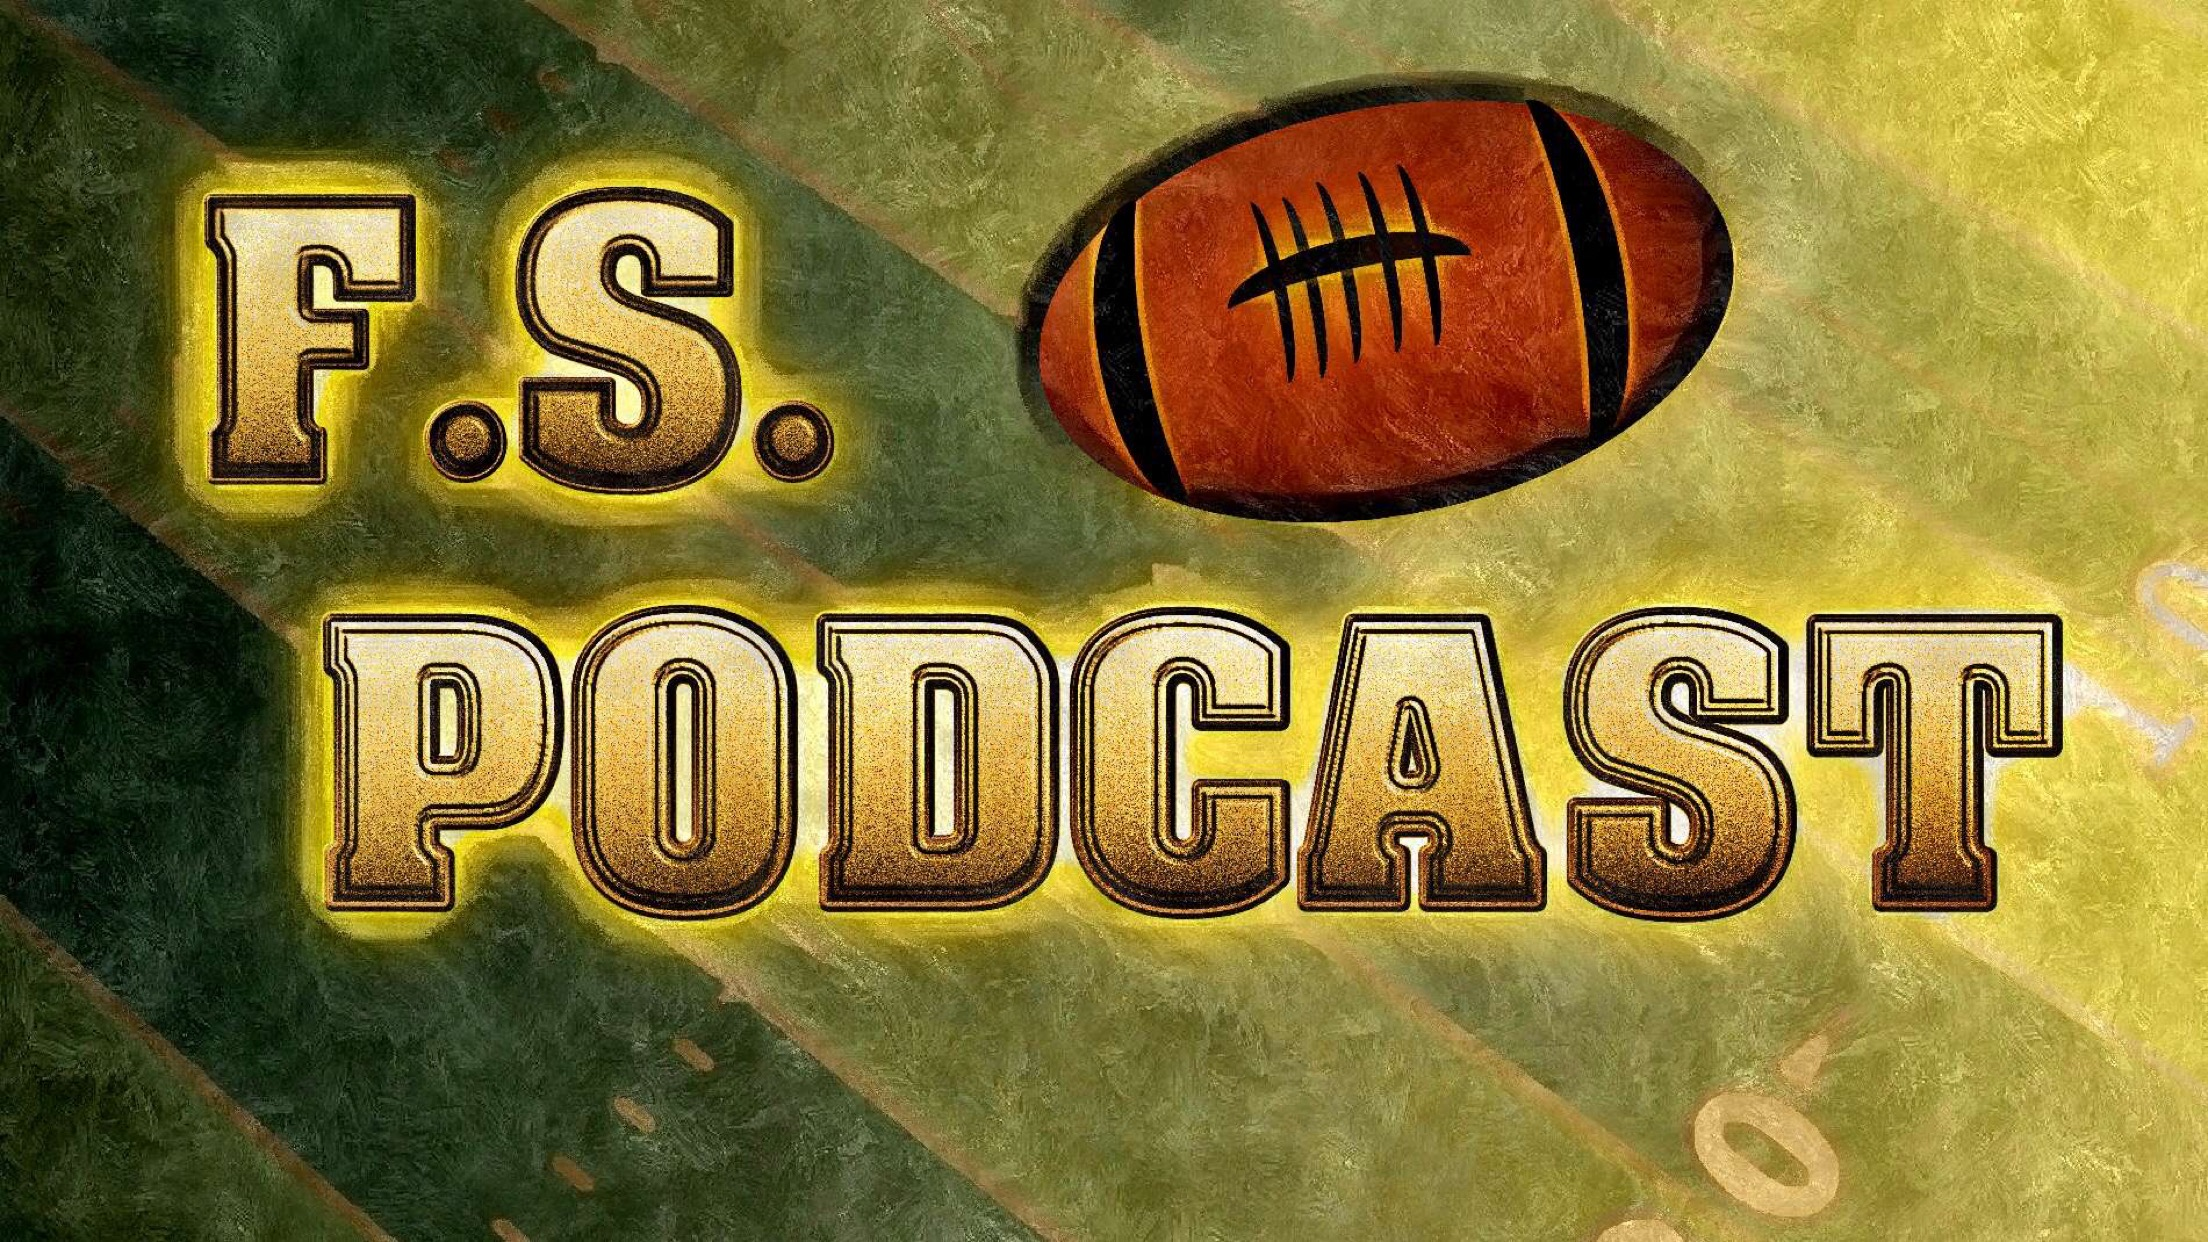 Artwork for NFL Playoff Retrospective + News + Retirements - F.S. Podcast Episode 58